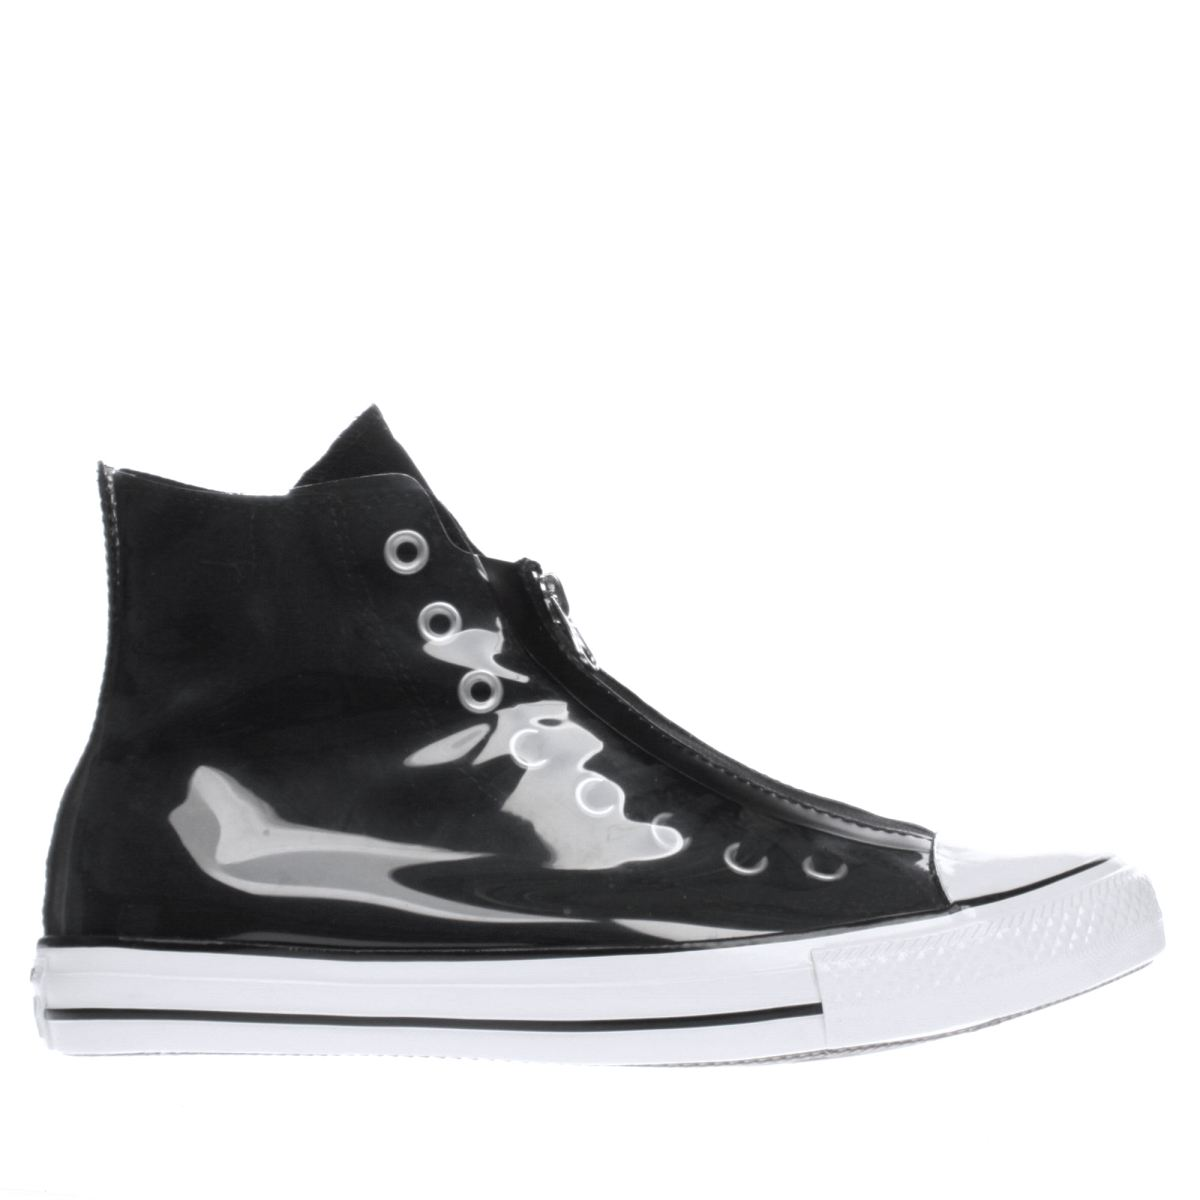 converse black & white shroud translucent hi trainers